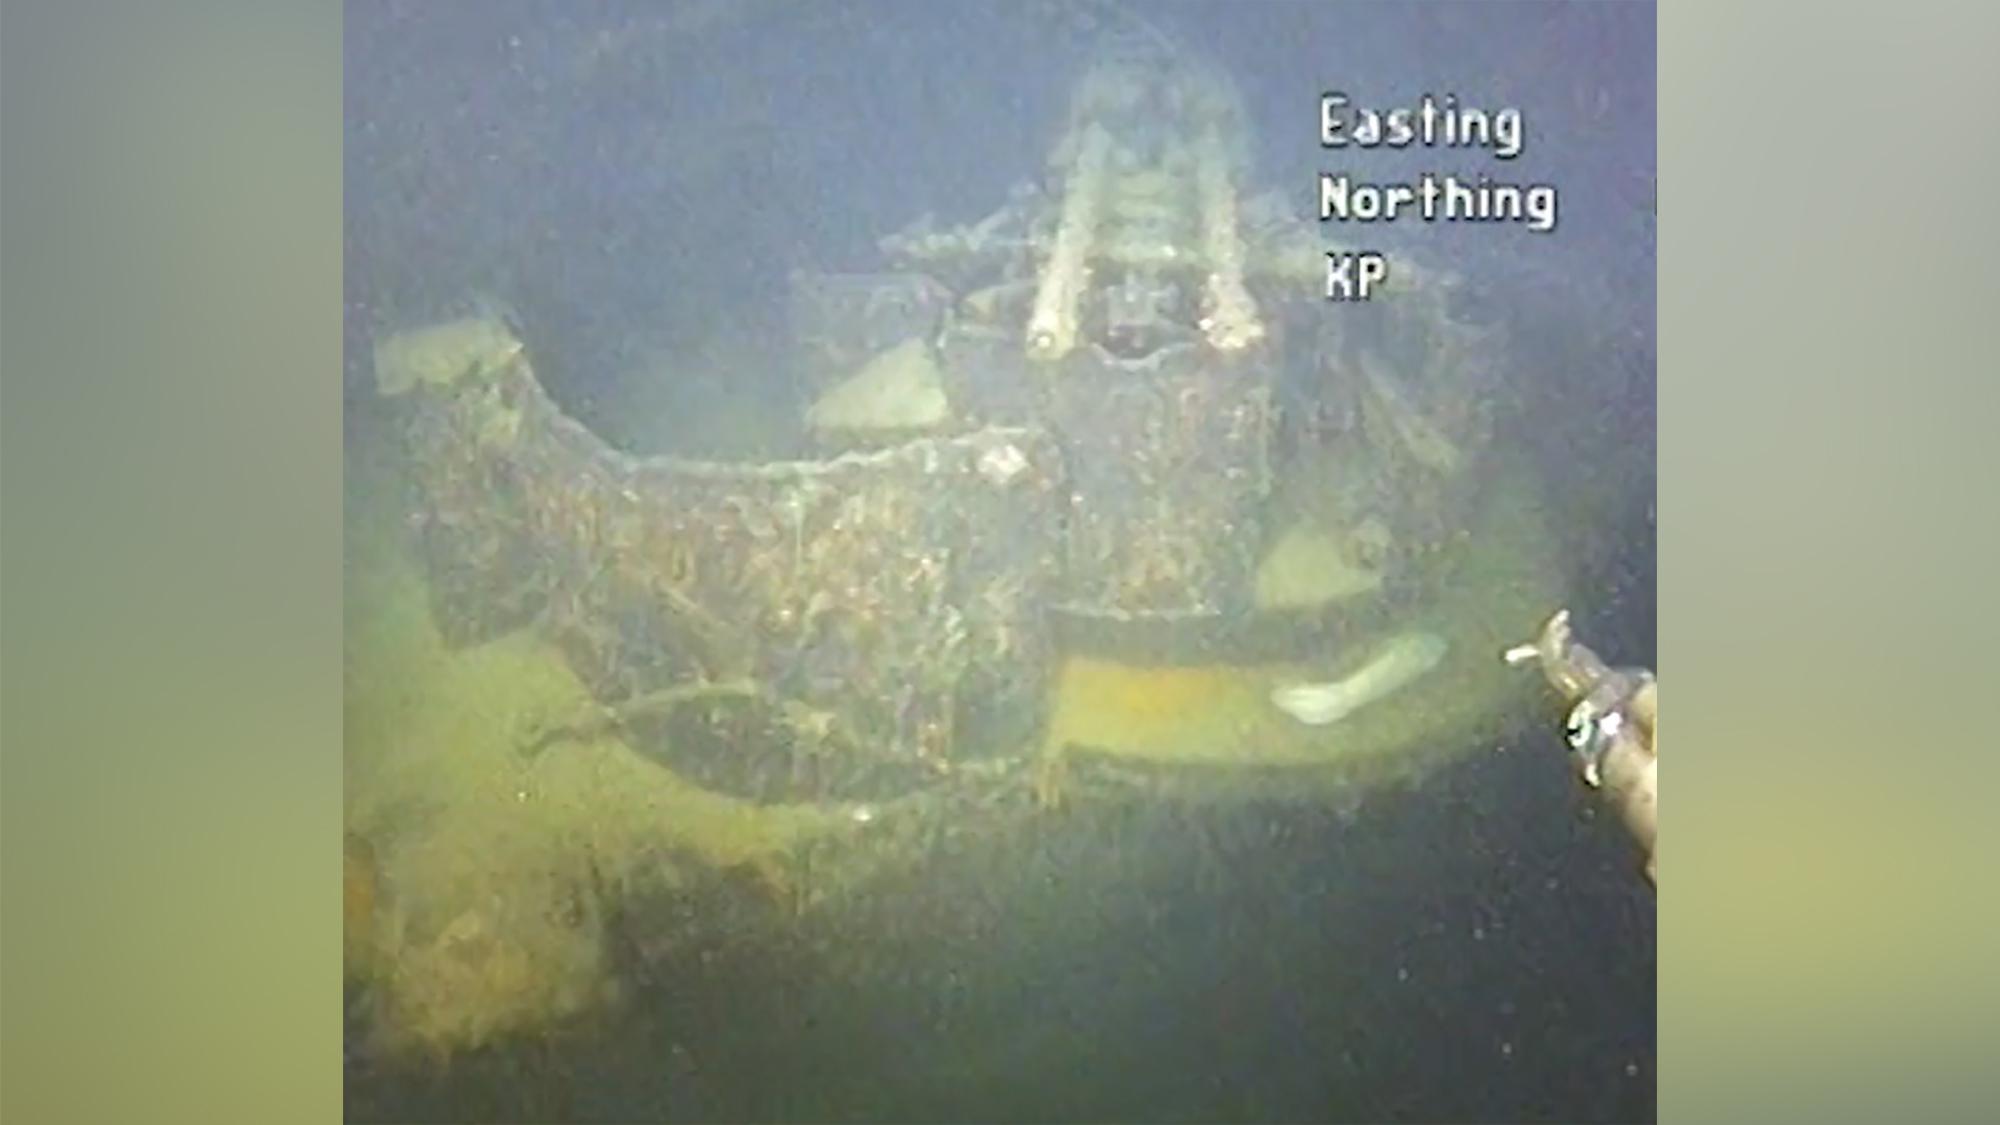 Navio de guerra encontrado no mar da Noruega 80 anos após naufragar